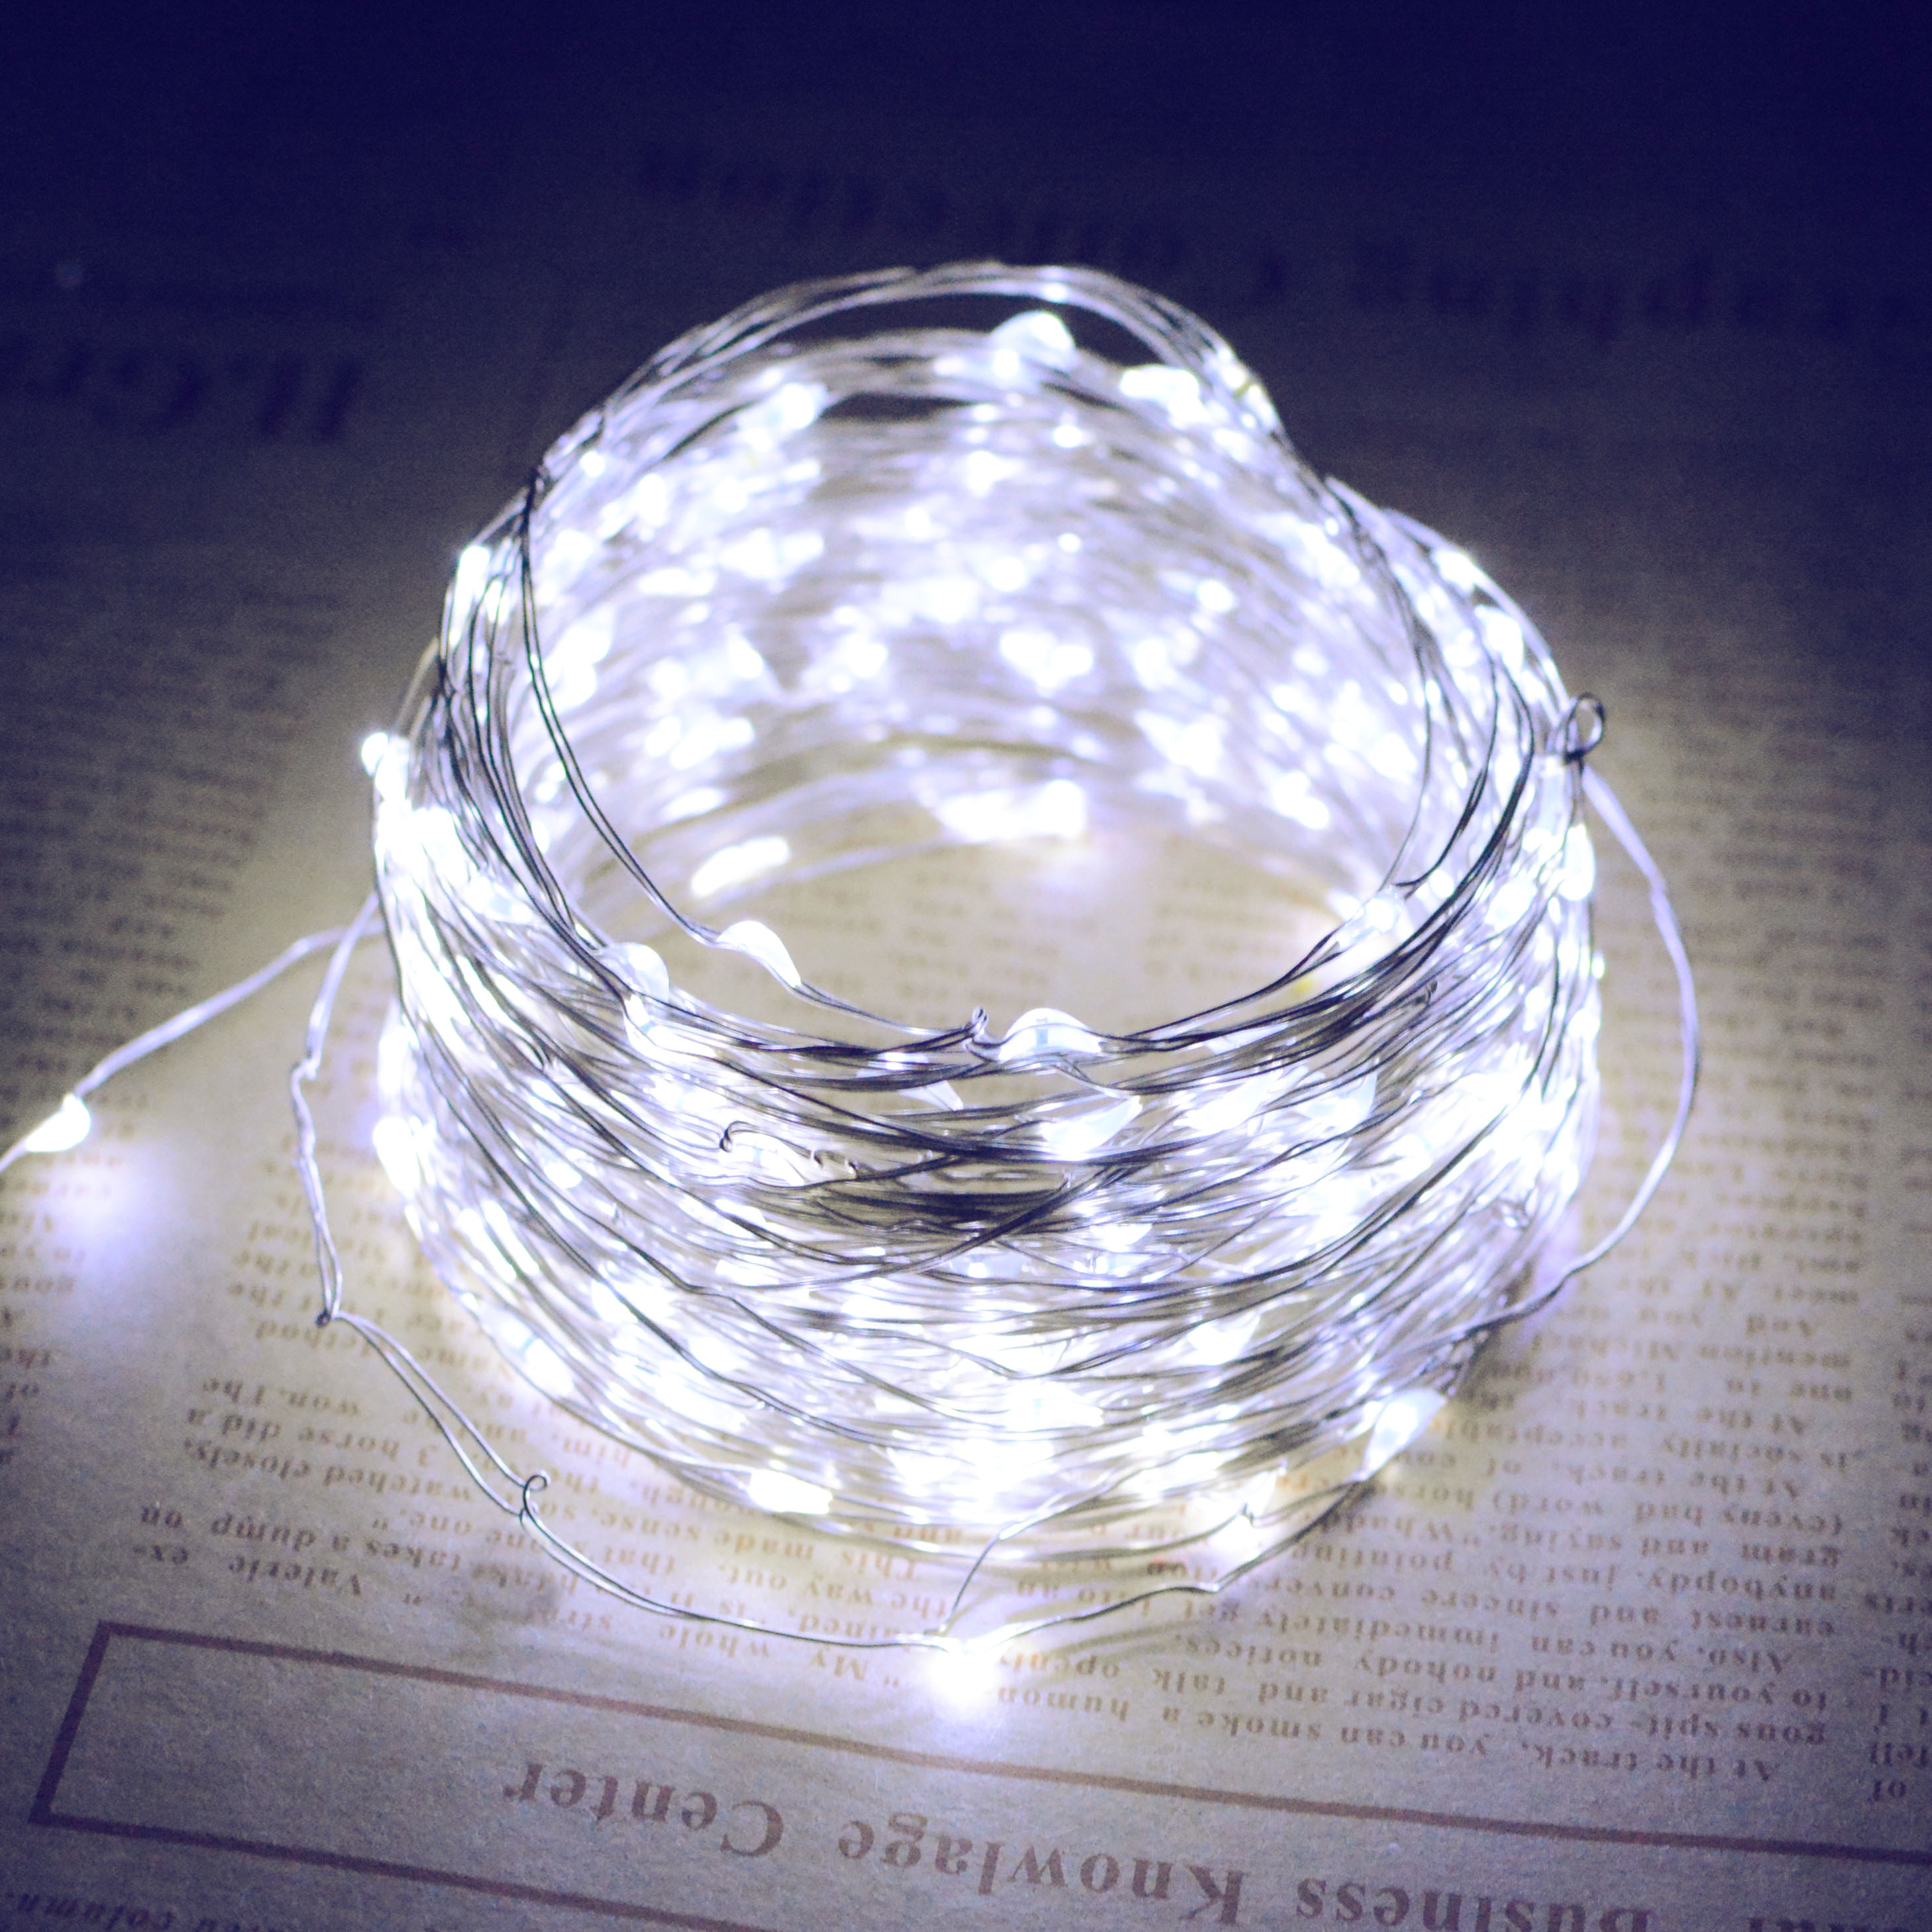 10M/20M 100LEDs/200LEDs Romanstic Solar Powered Copper Wire String Light White light_10 meters 100 LED_(ME0003301)